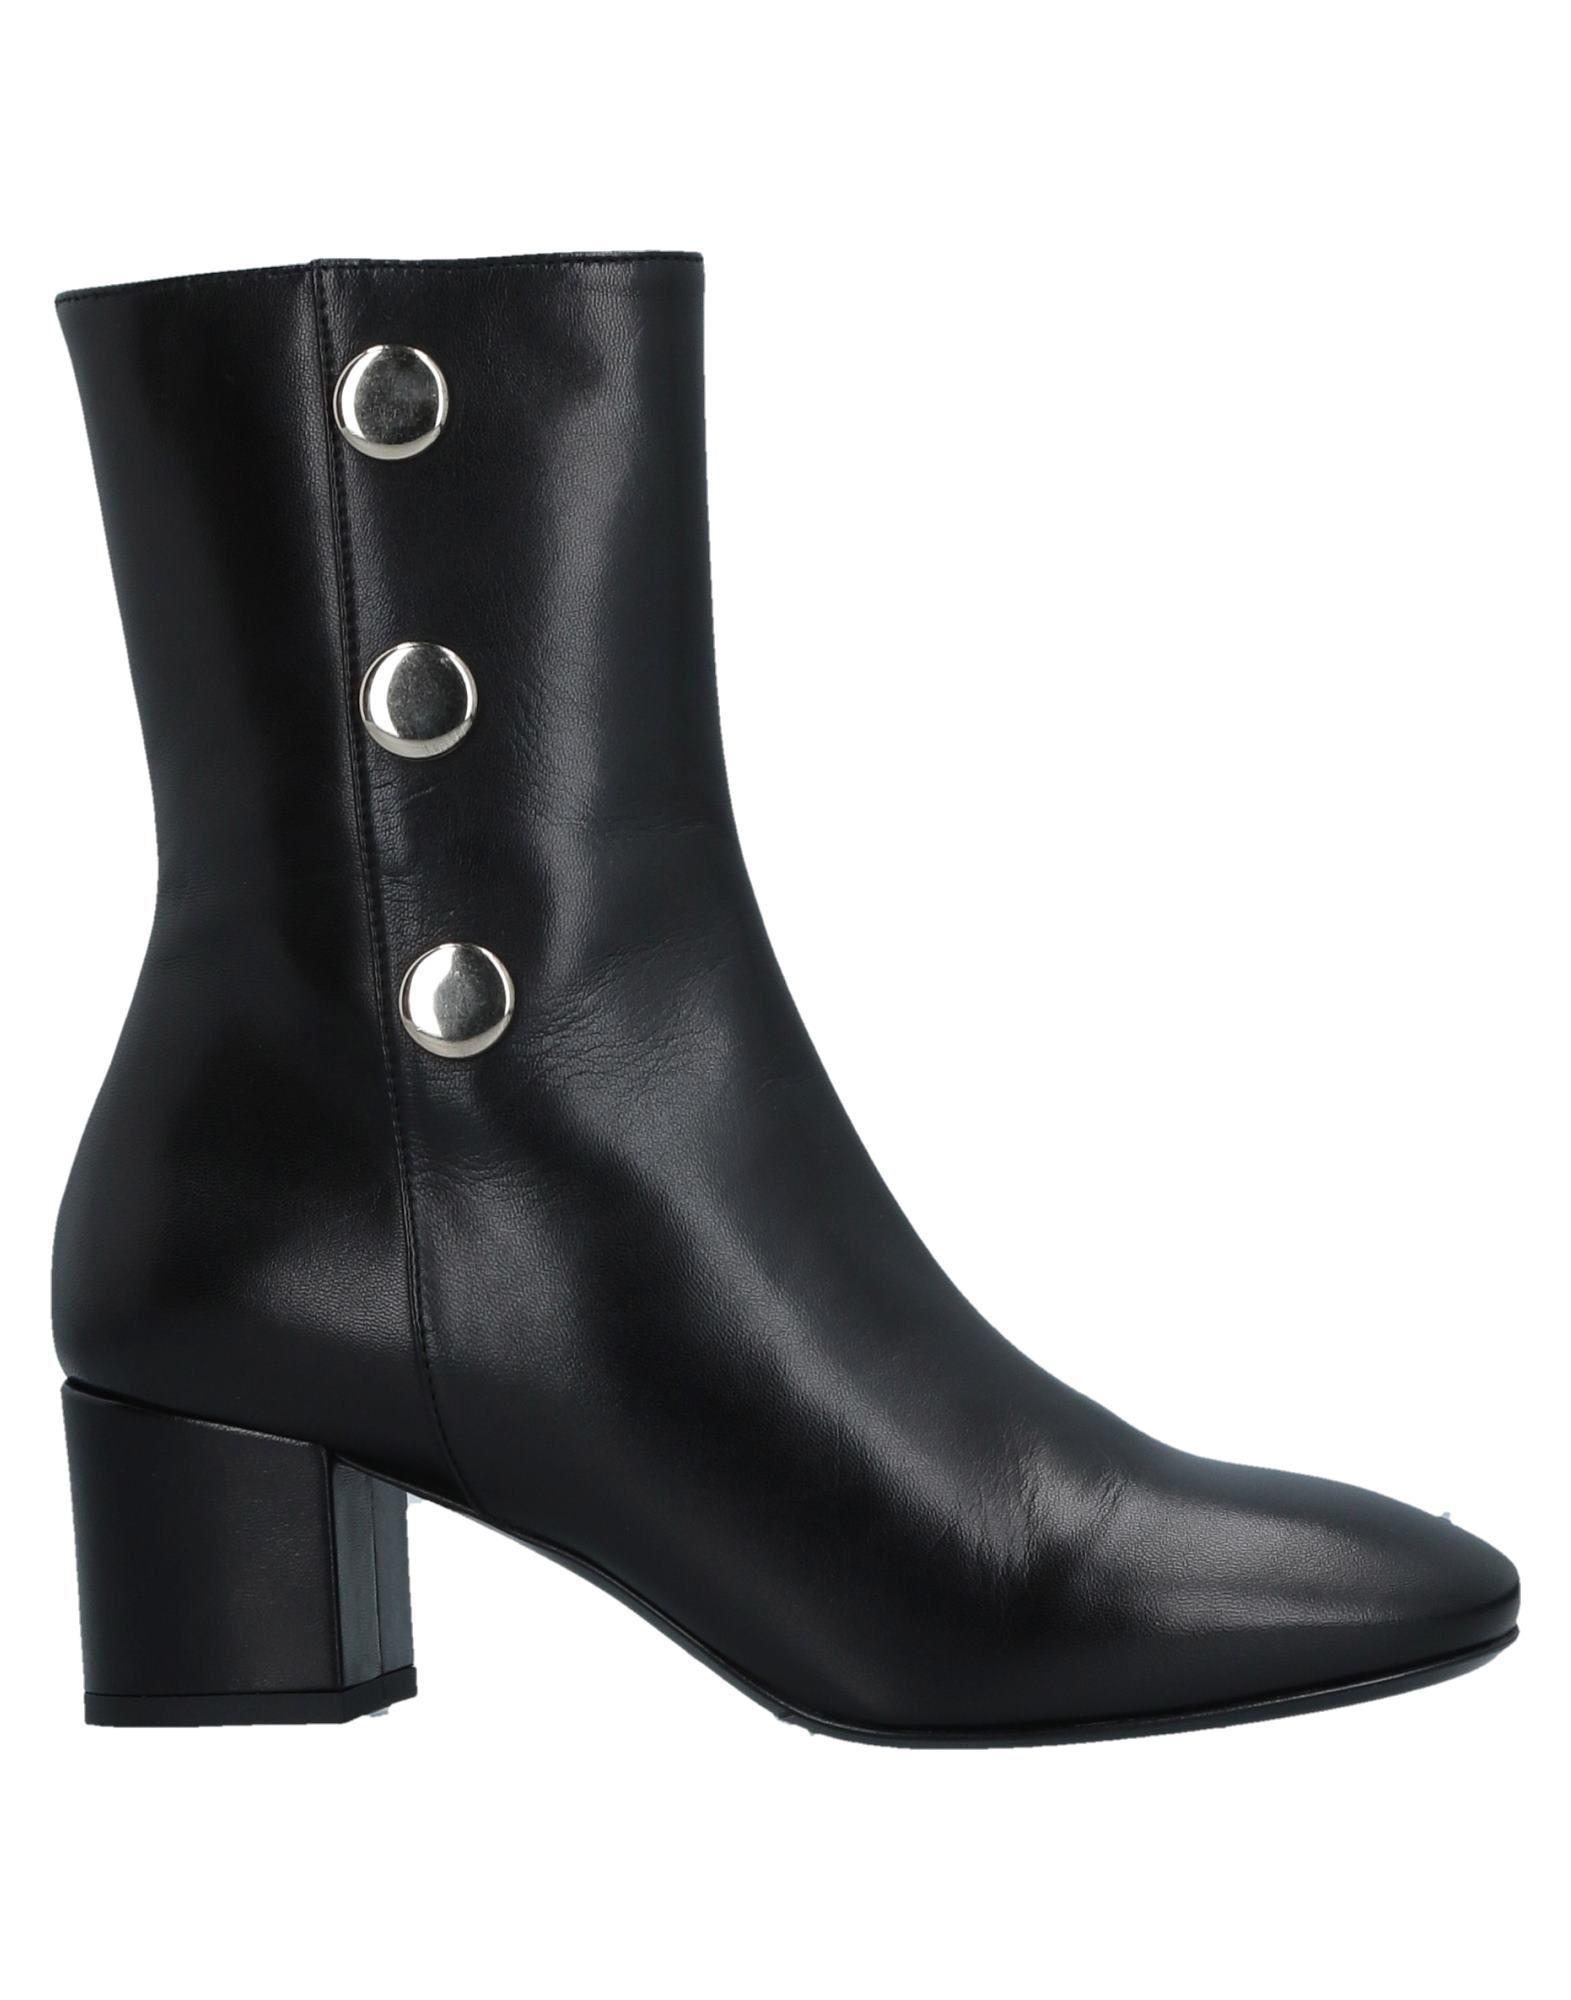 Black Boots Lyst Carla in G Ankle f7gxXwq1n